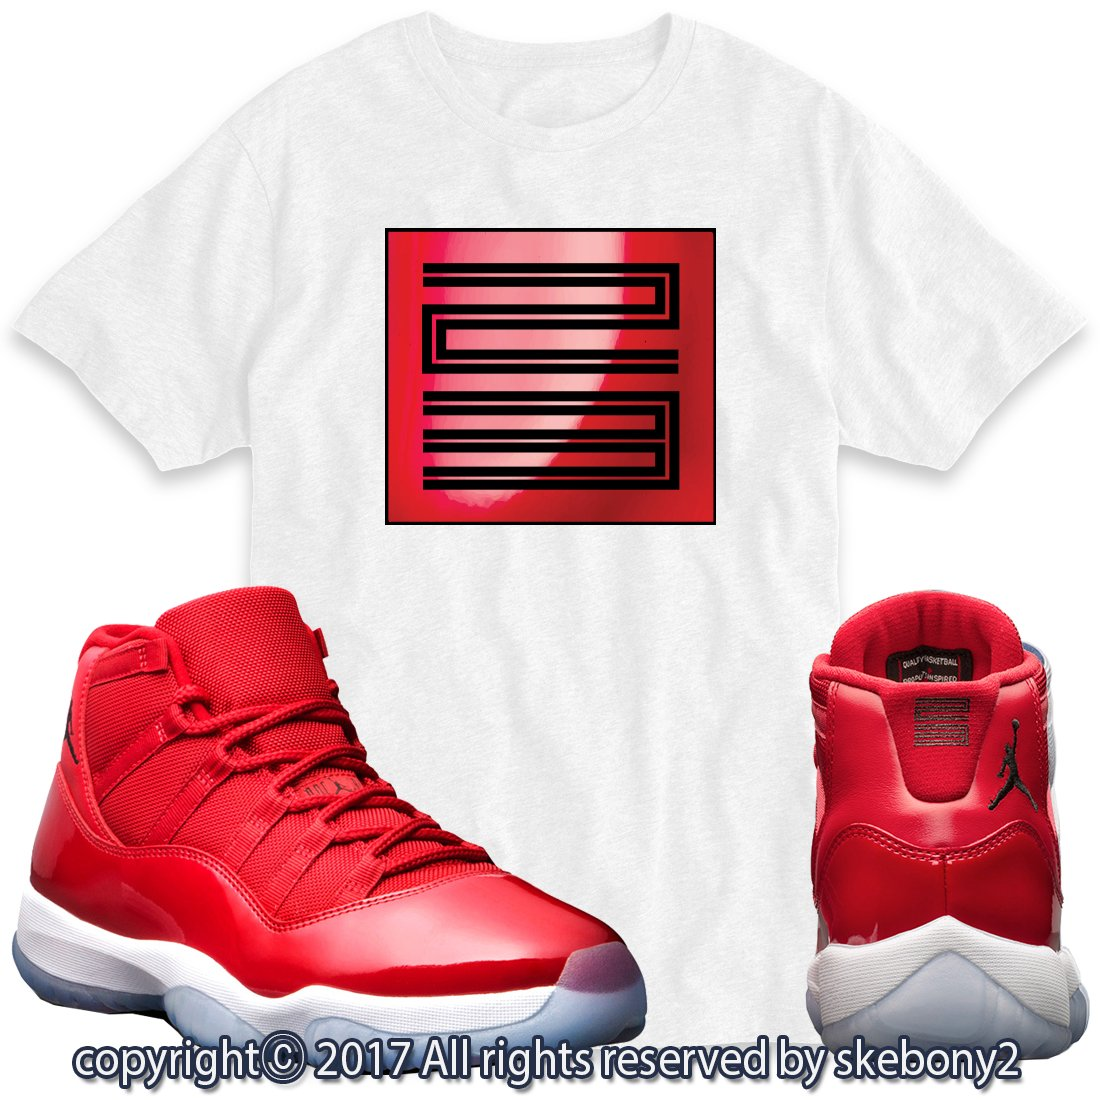 buy popular 72873 4c0e9 Custom T Shirt Matching AIR Jordan 11 Win Like 96 Matching TEE Bulls red  JD-11-3-4